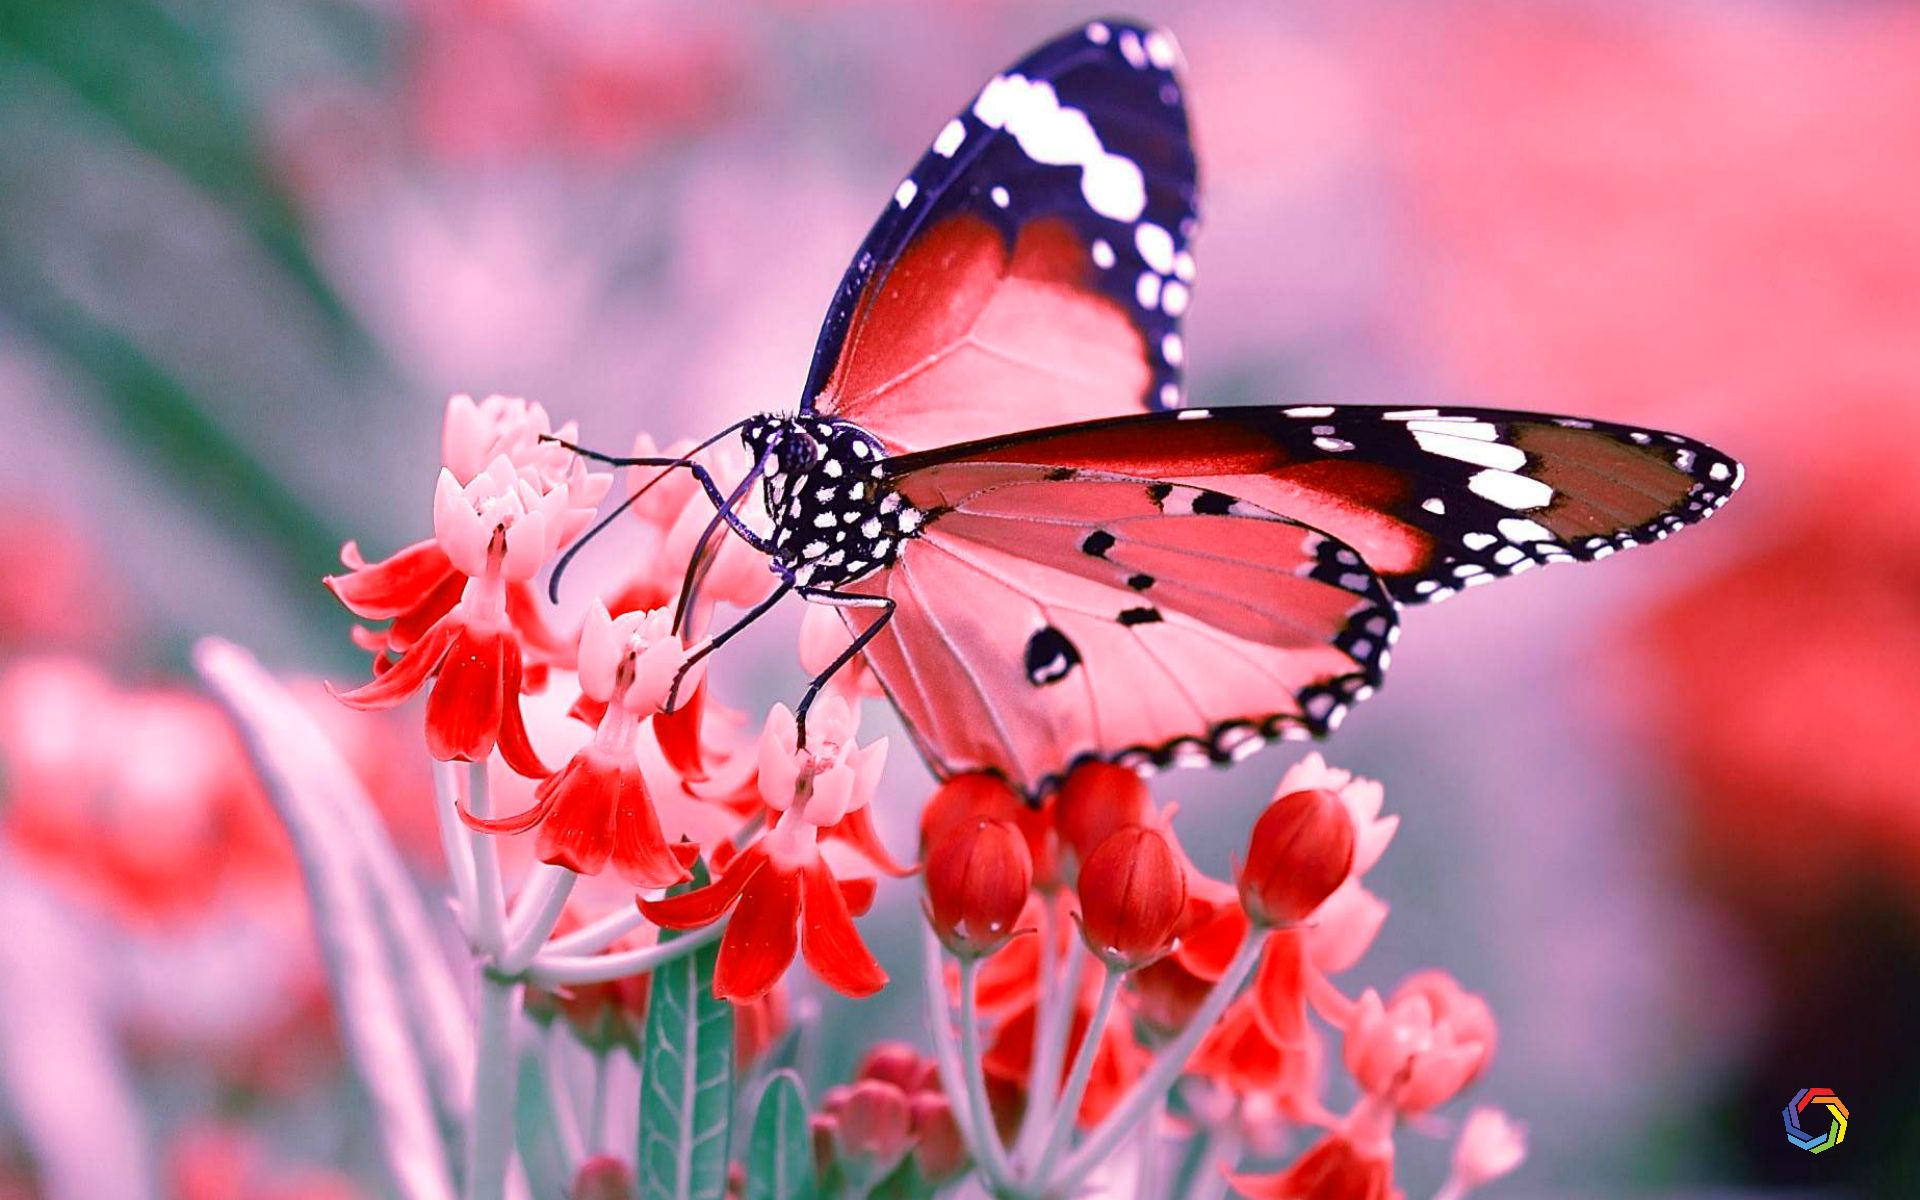 High Definition Butterfly Wallpaper Hd 3290883 Hd Wallpaper Backgrounds Download